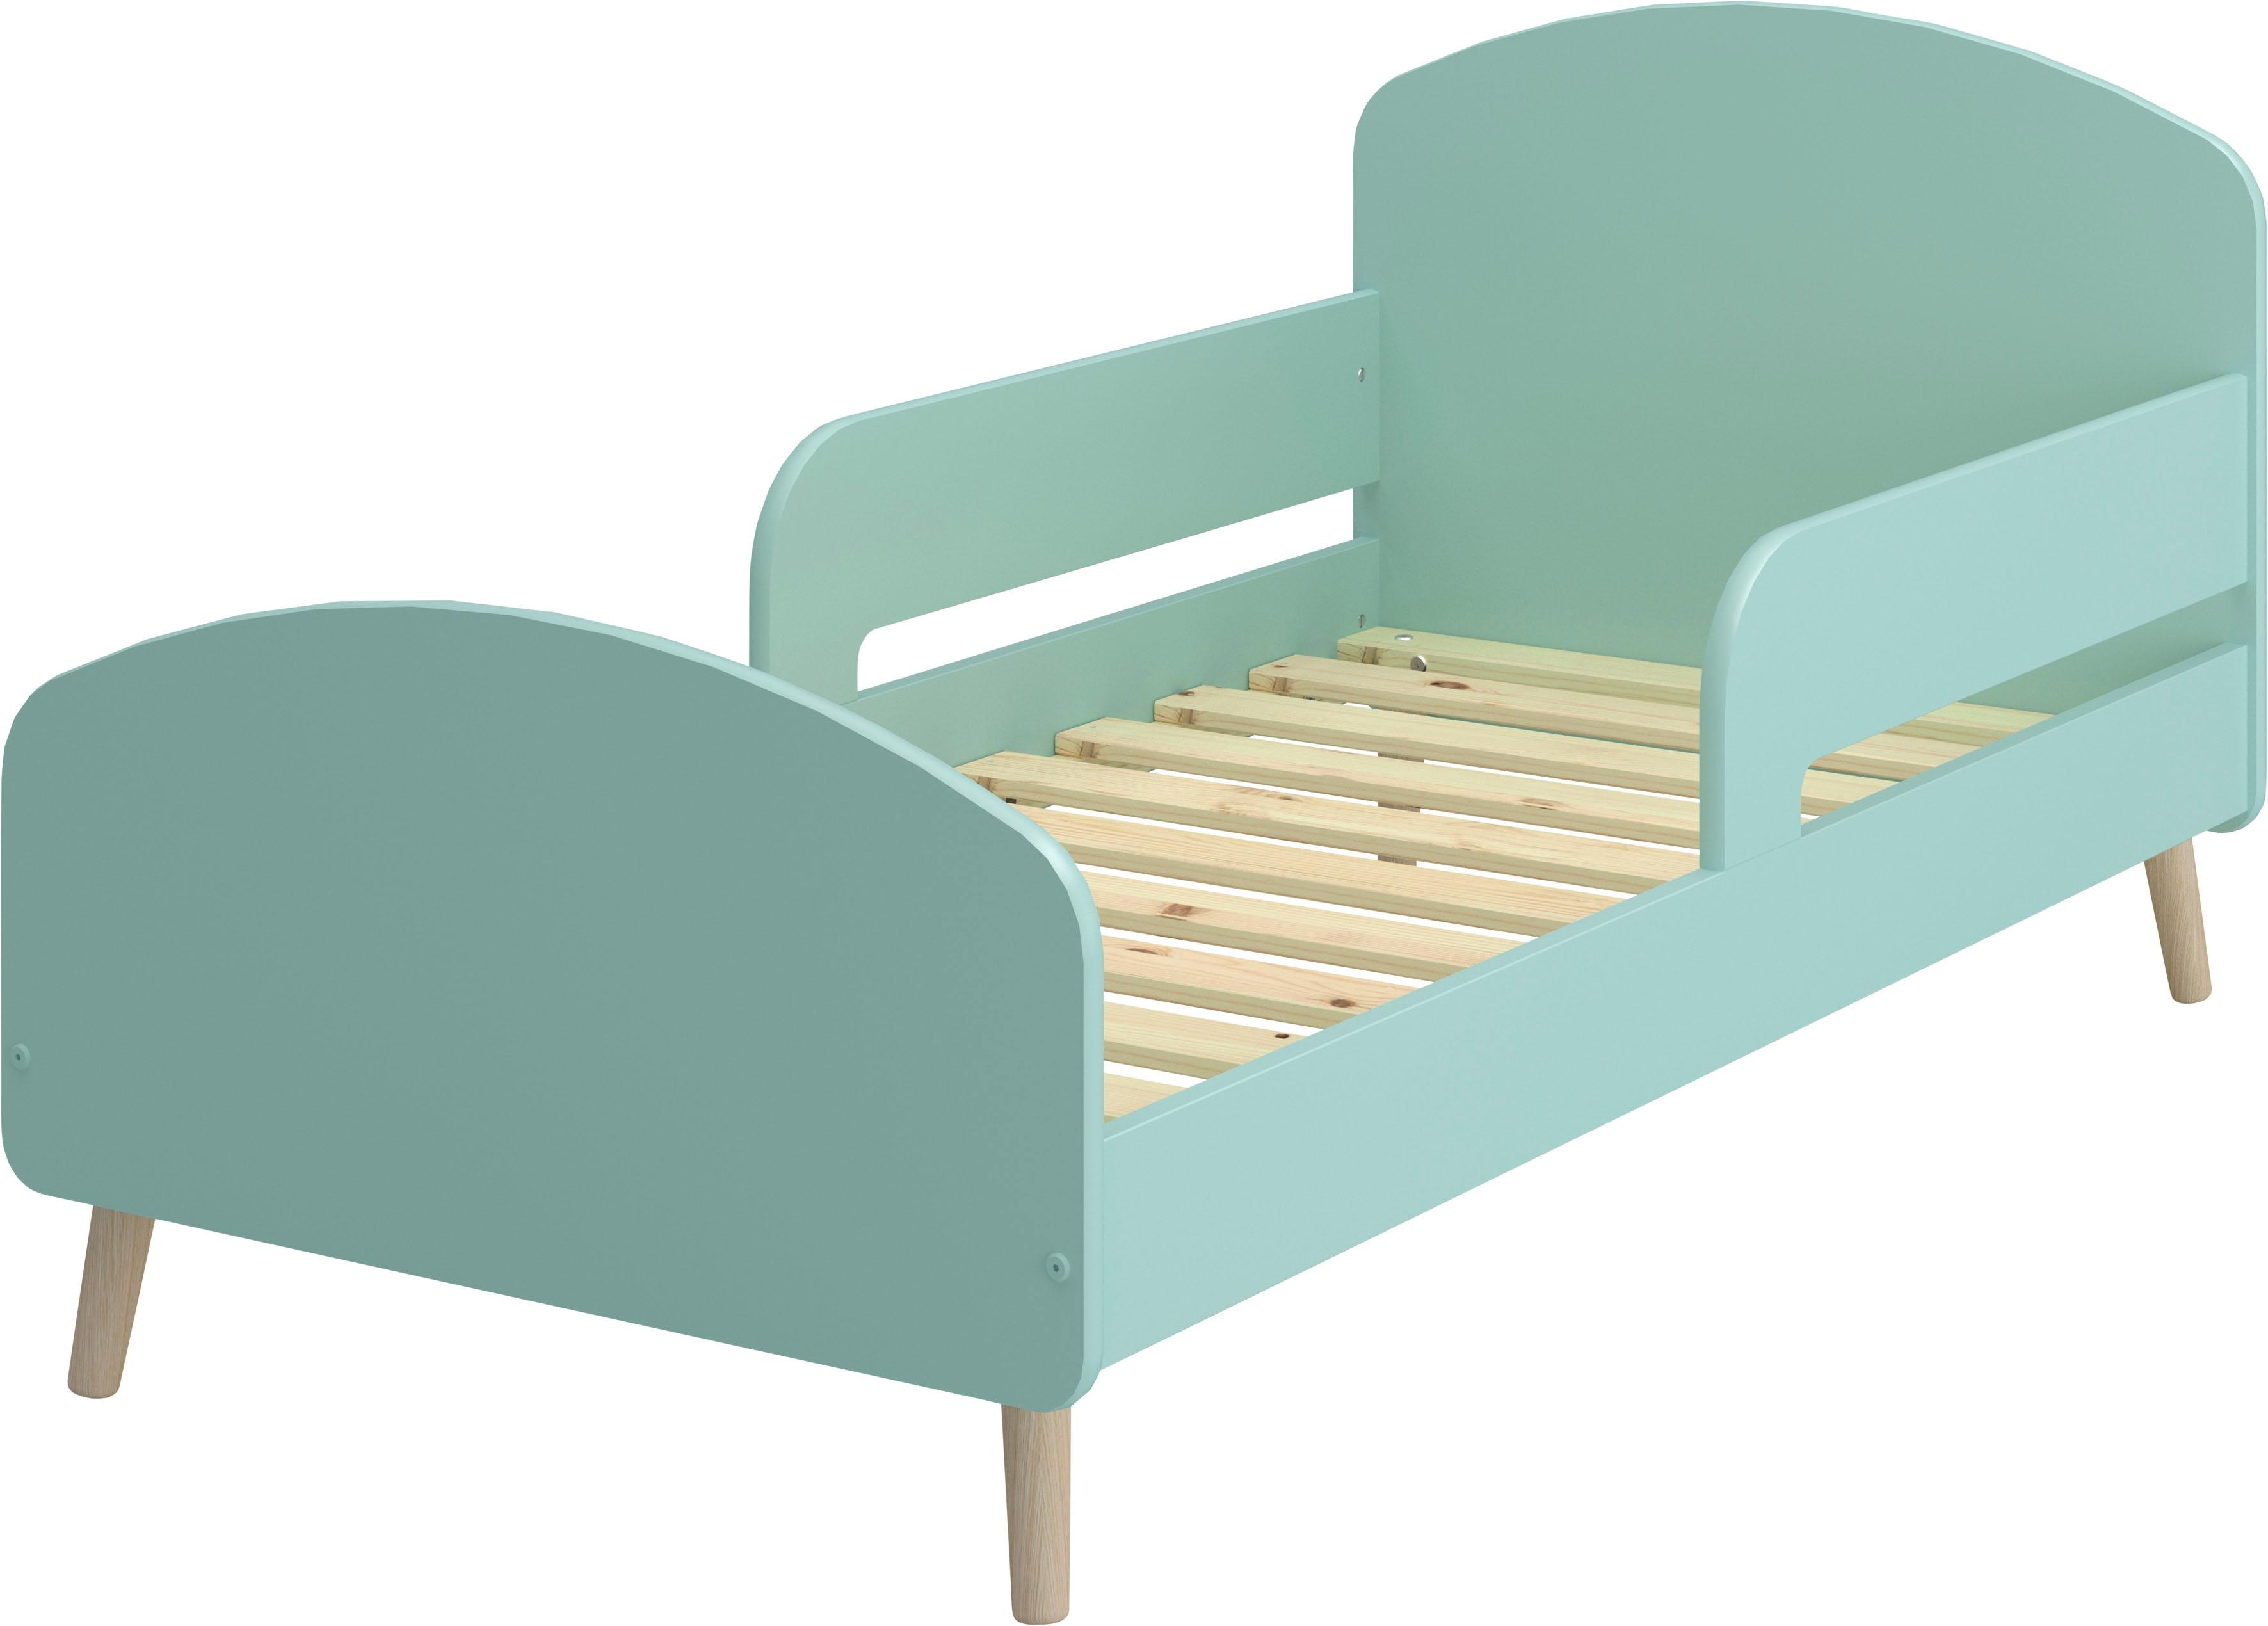 STEENS Kinderbett GAIA grün Kinder Kinderbetten Kindermöbel